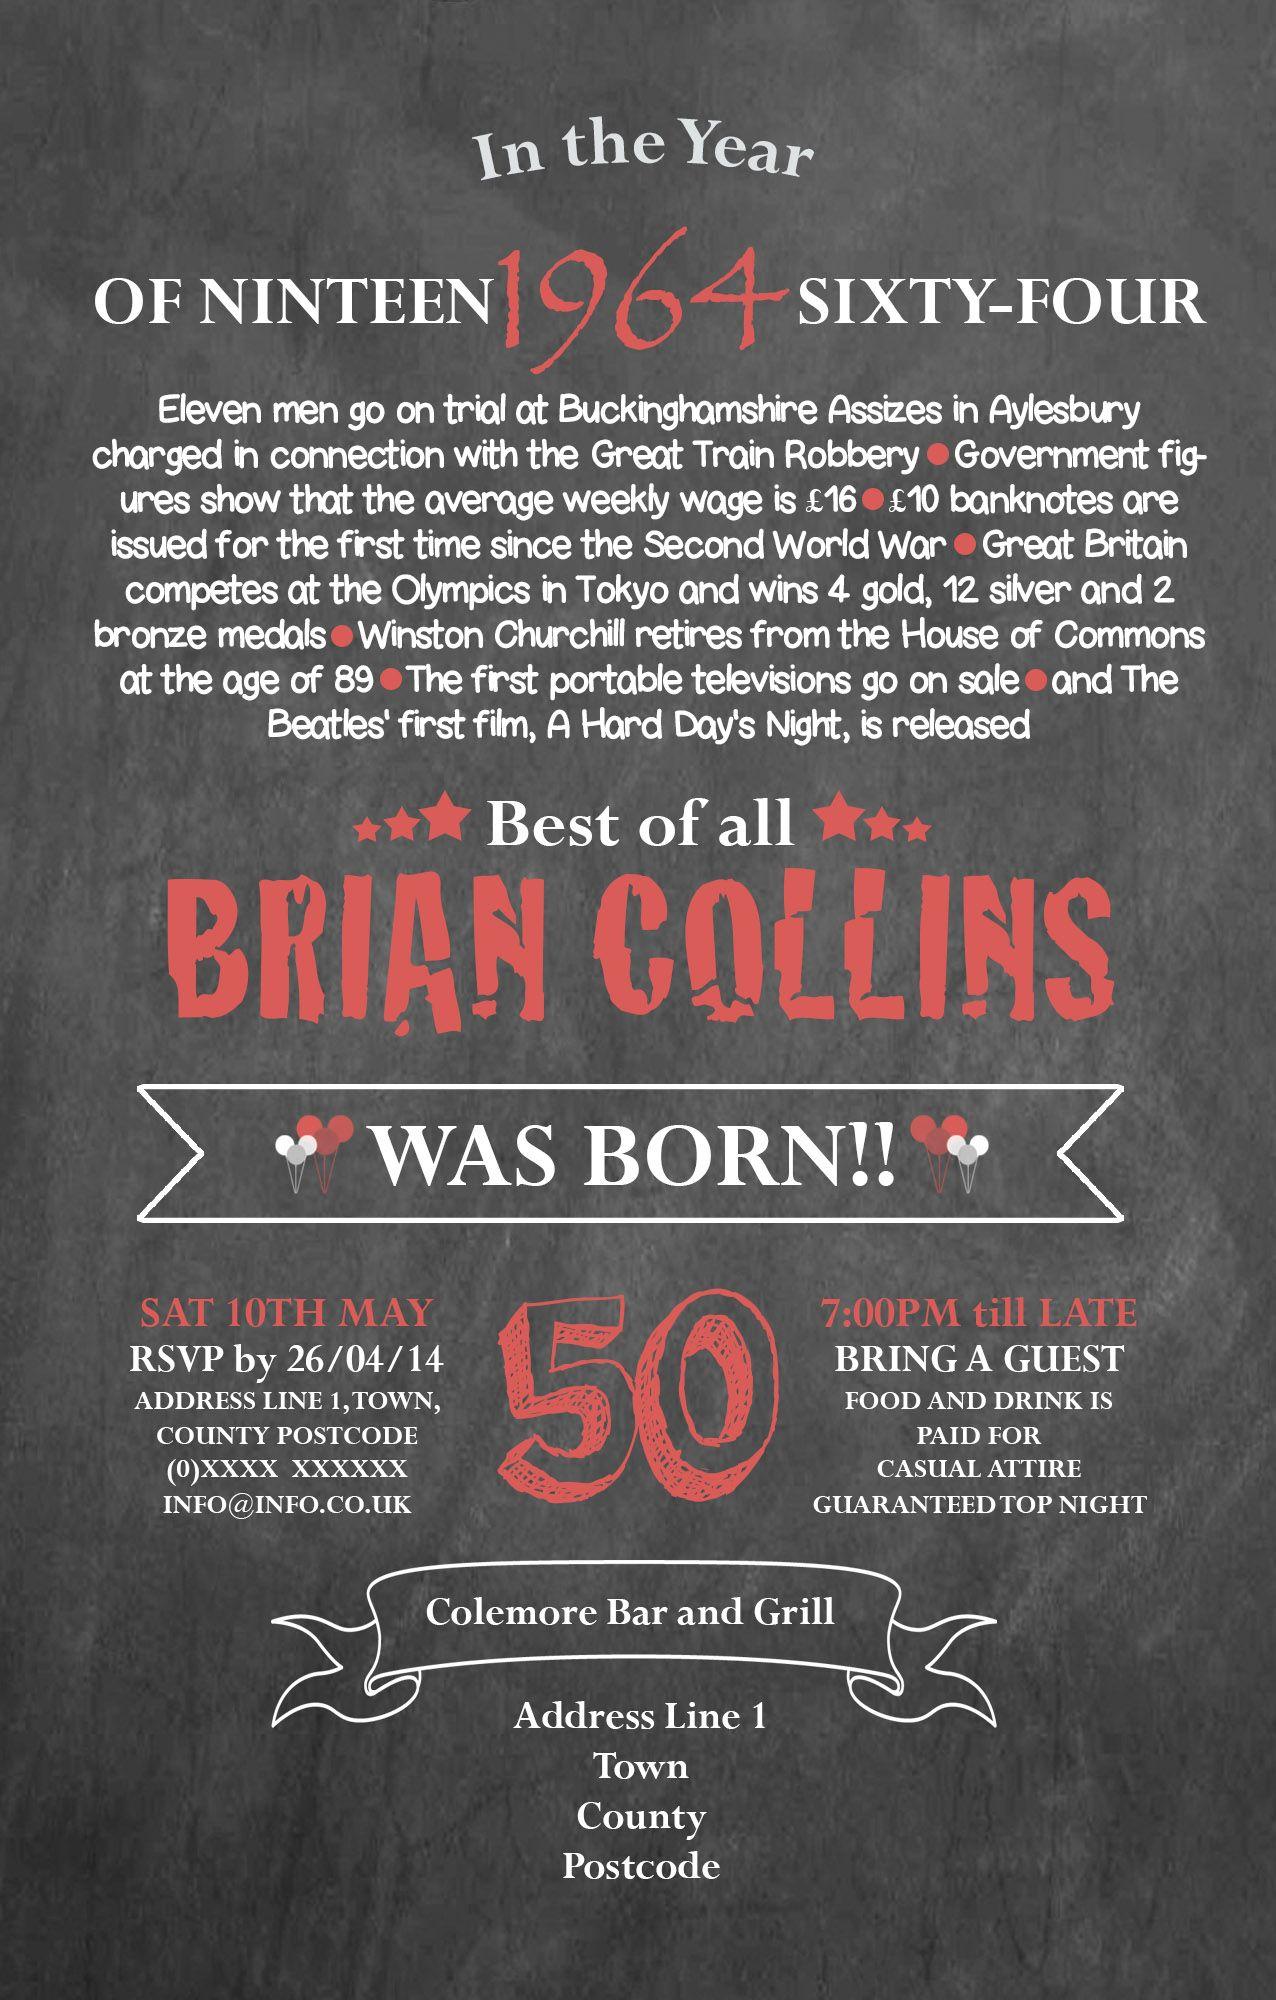 50th Birthday Invitation designed by me at Nic\'s Designs. | Invites ...